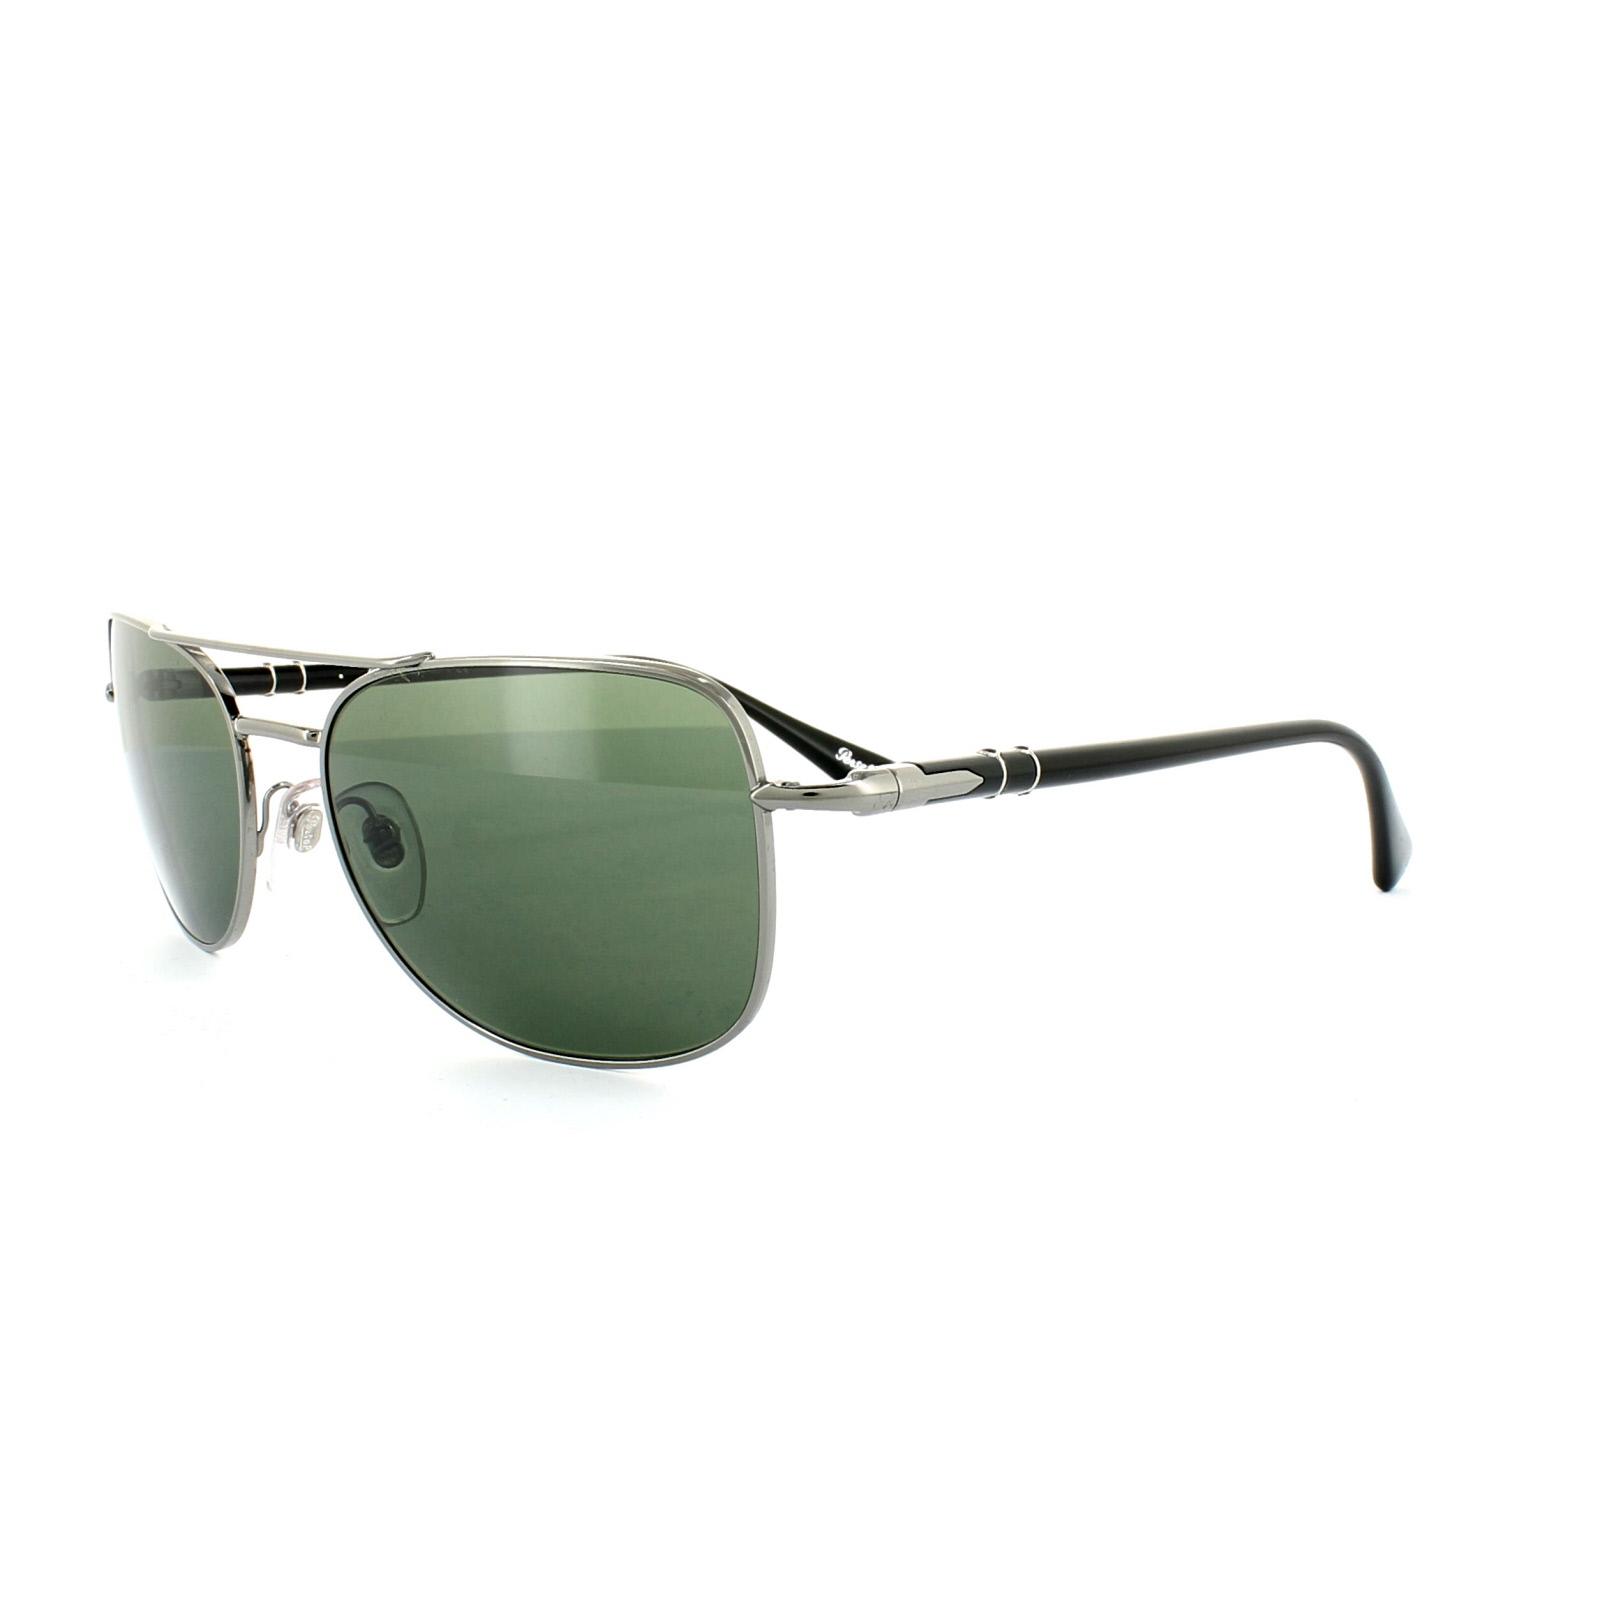 87d557d54e918 Sentinel Persol Sunglasses 2420 513 31 Gunmetal Crystal Green